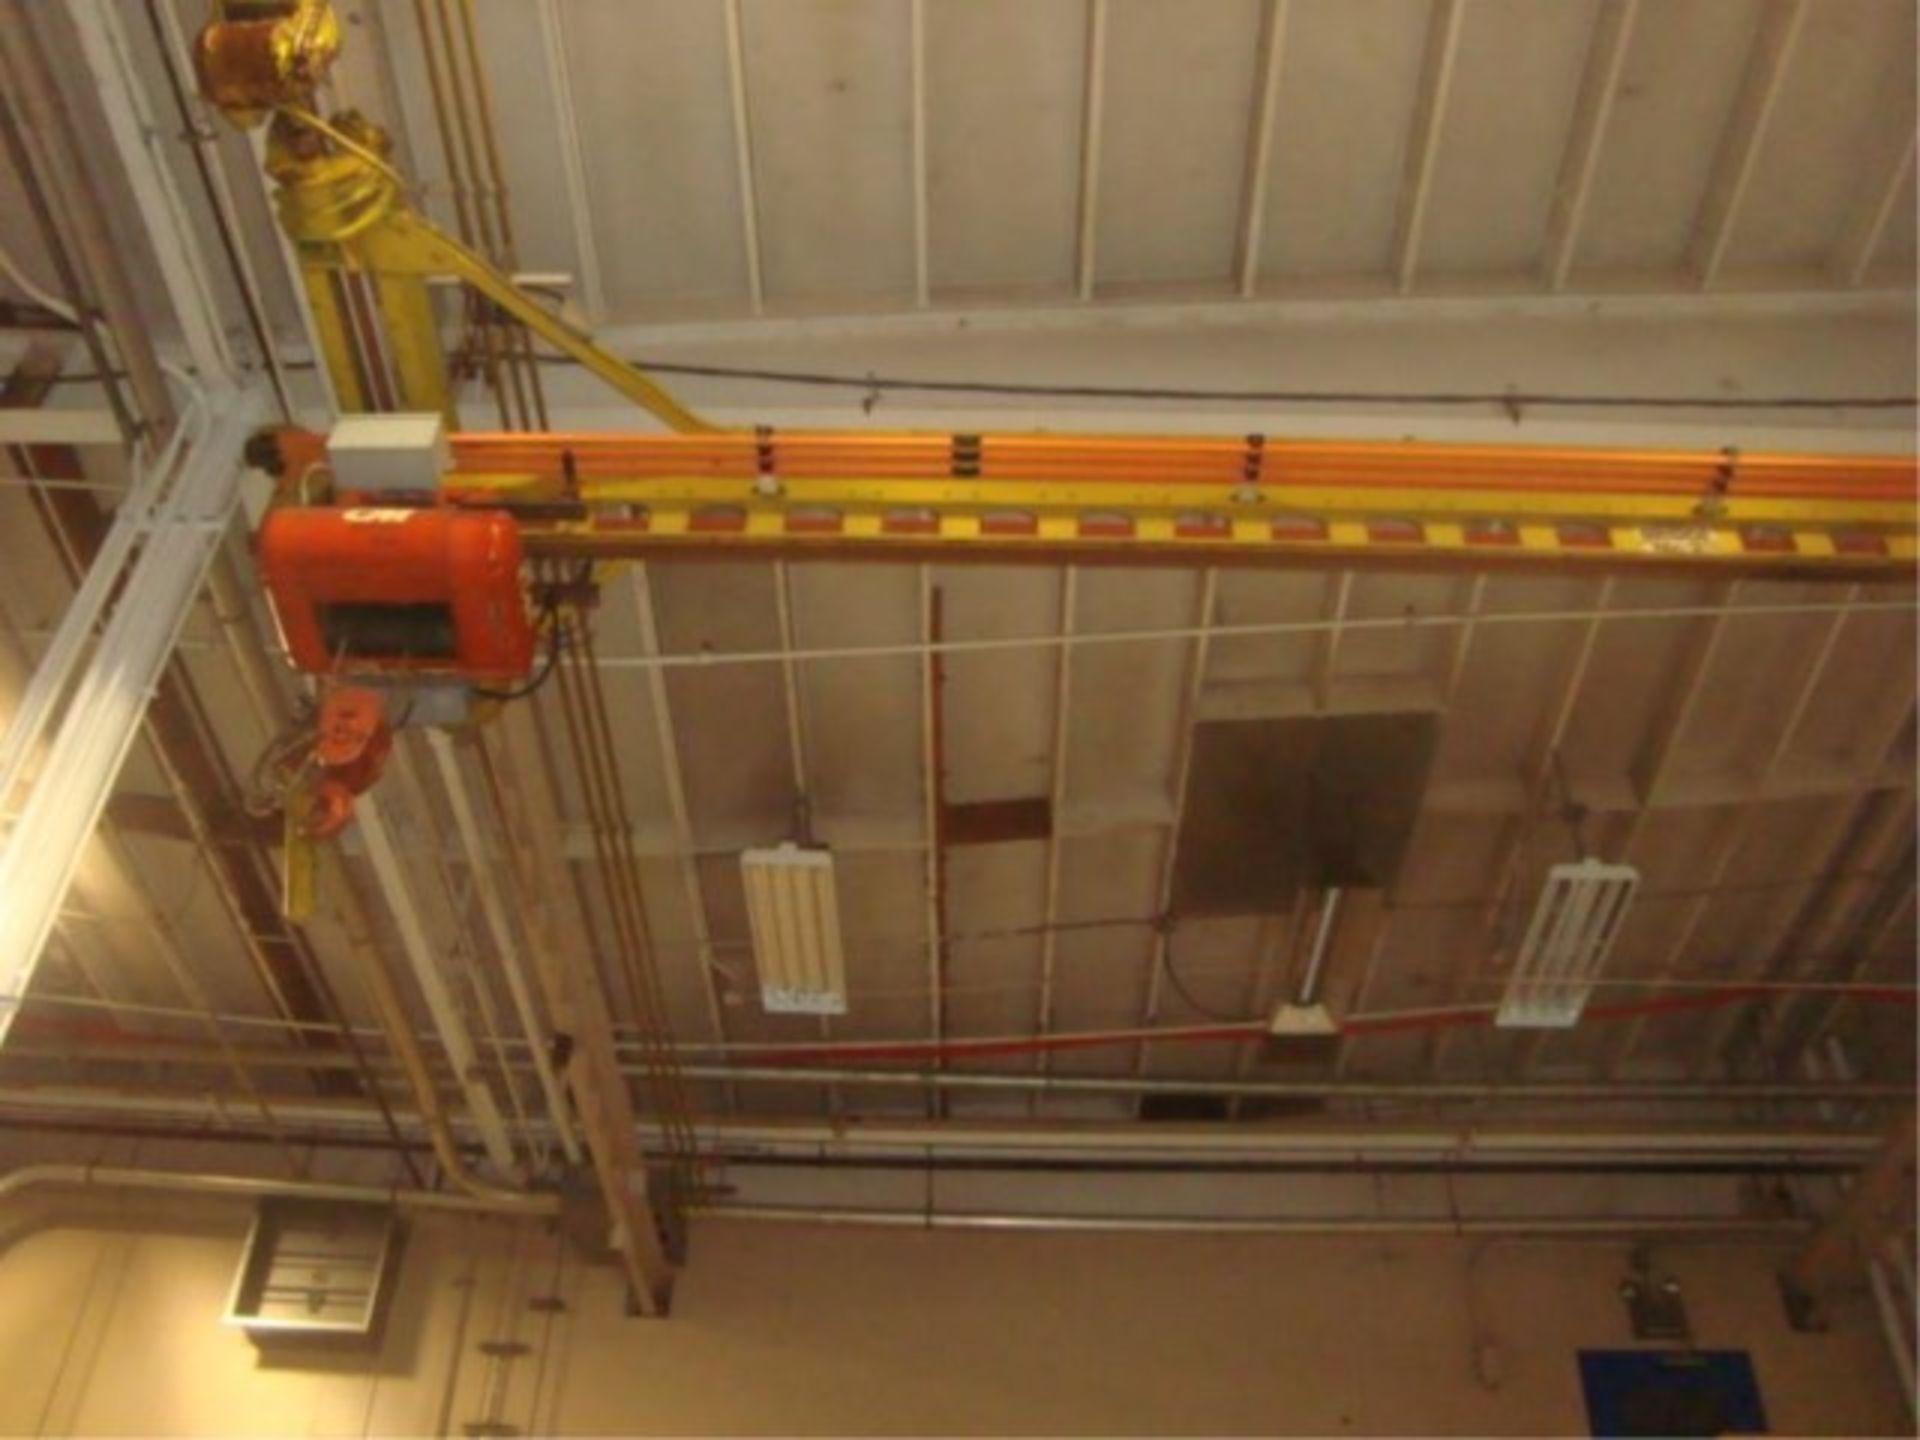 Lot 114 - 5-Ton Capacity Overhead Bridge Crane